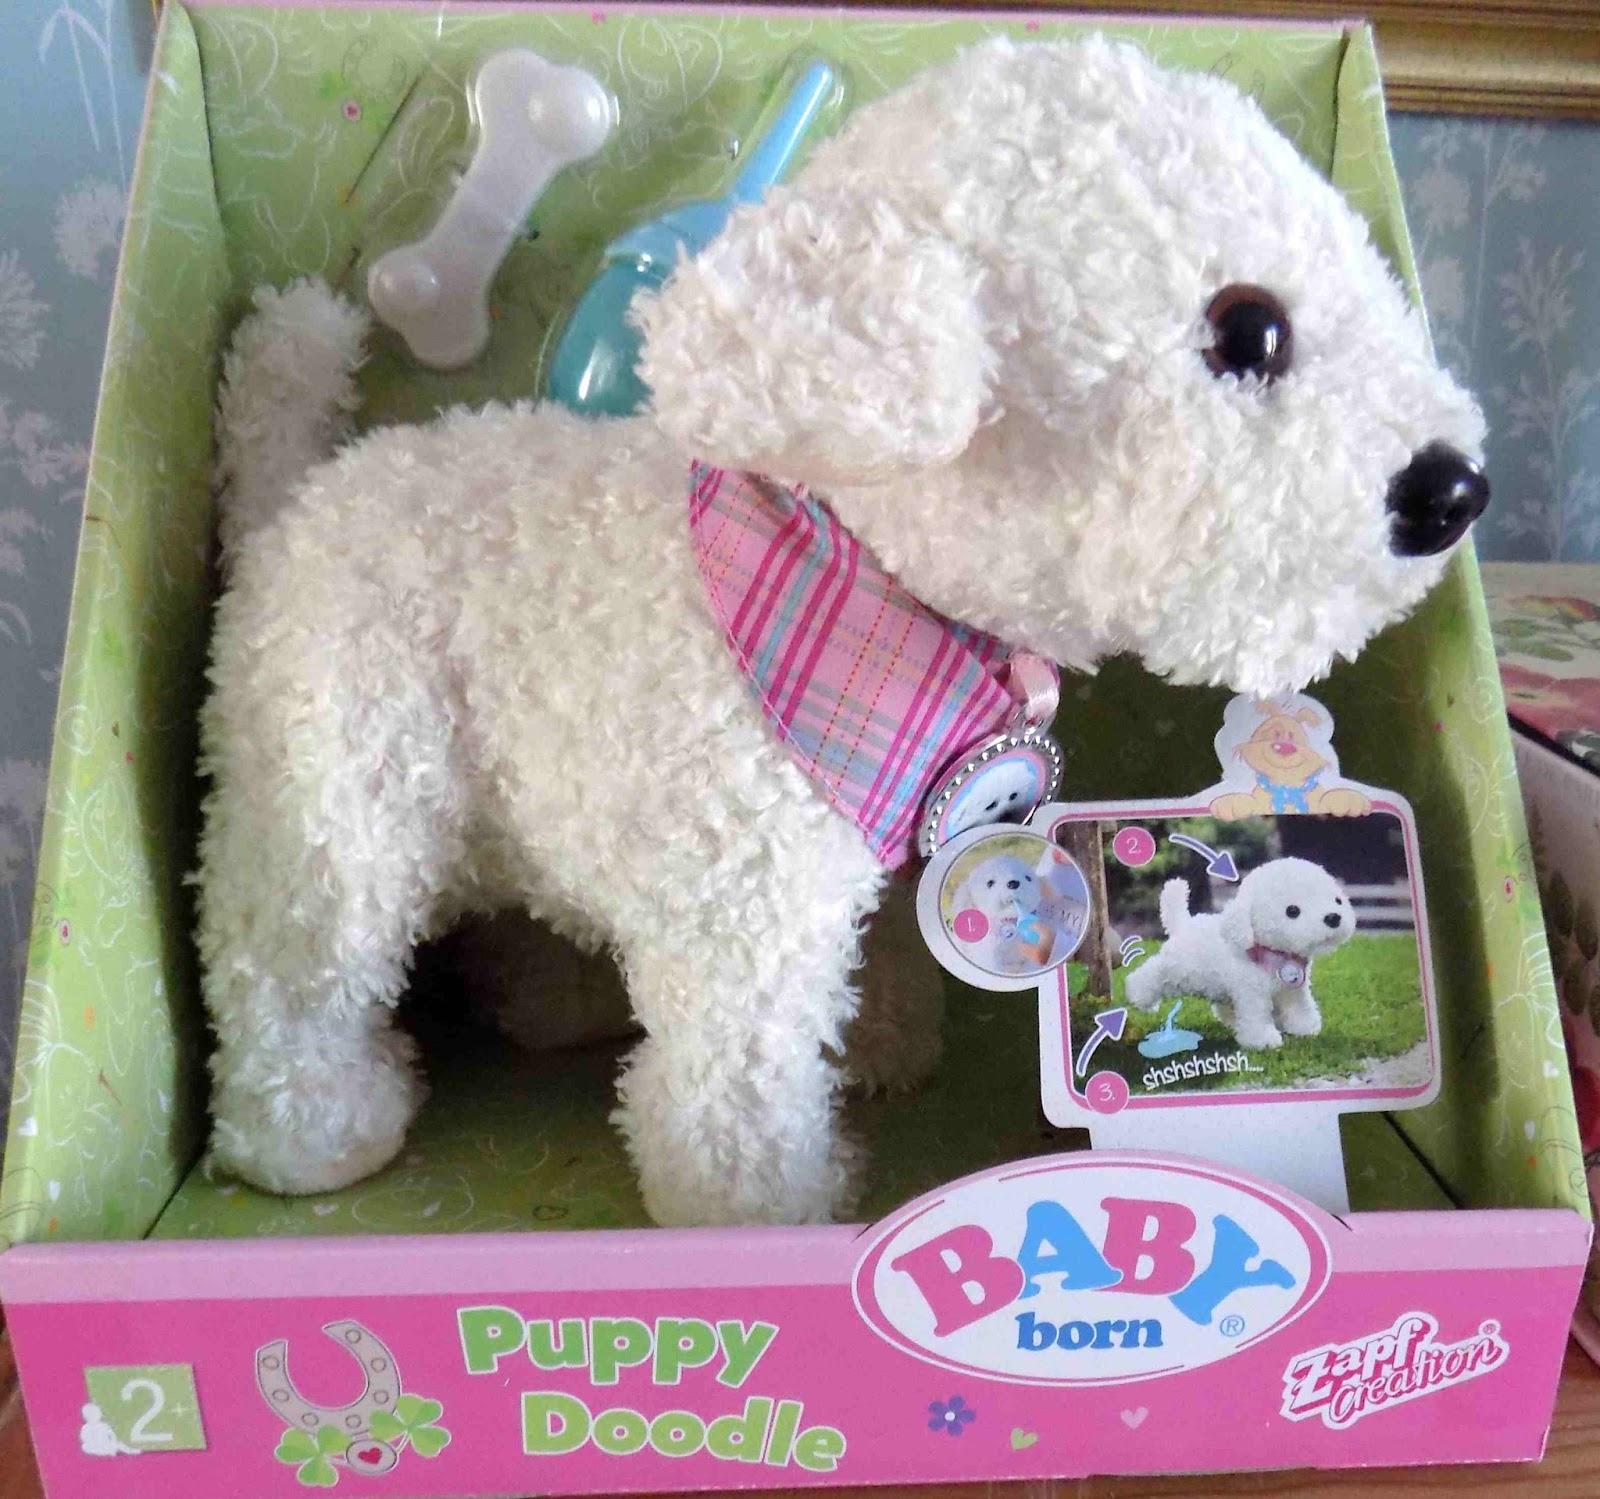 baby born puppy